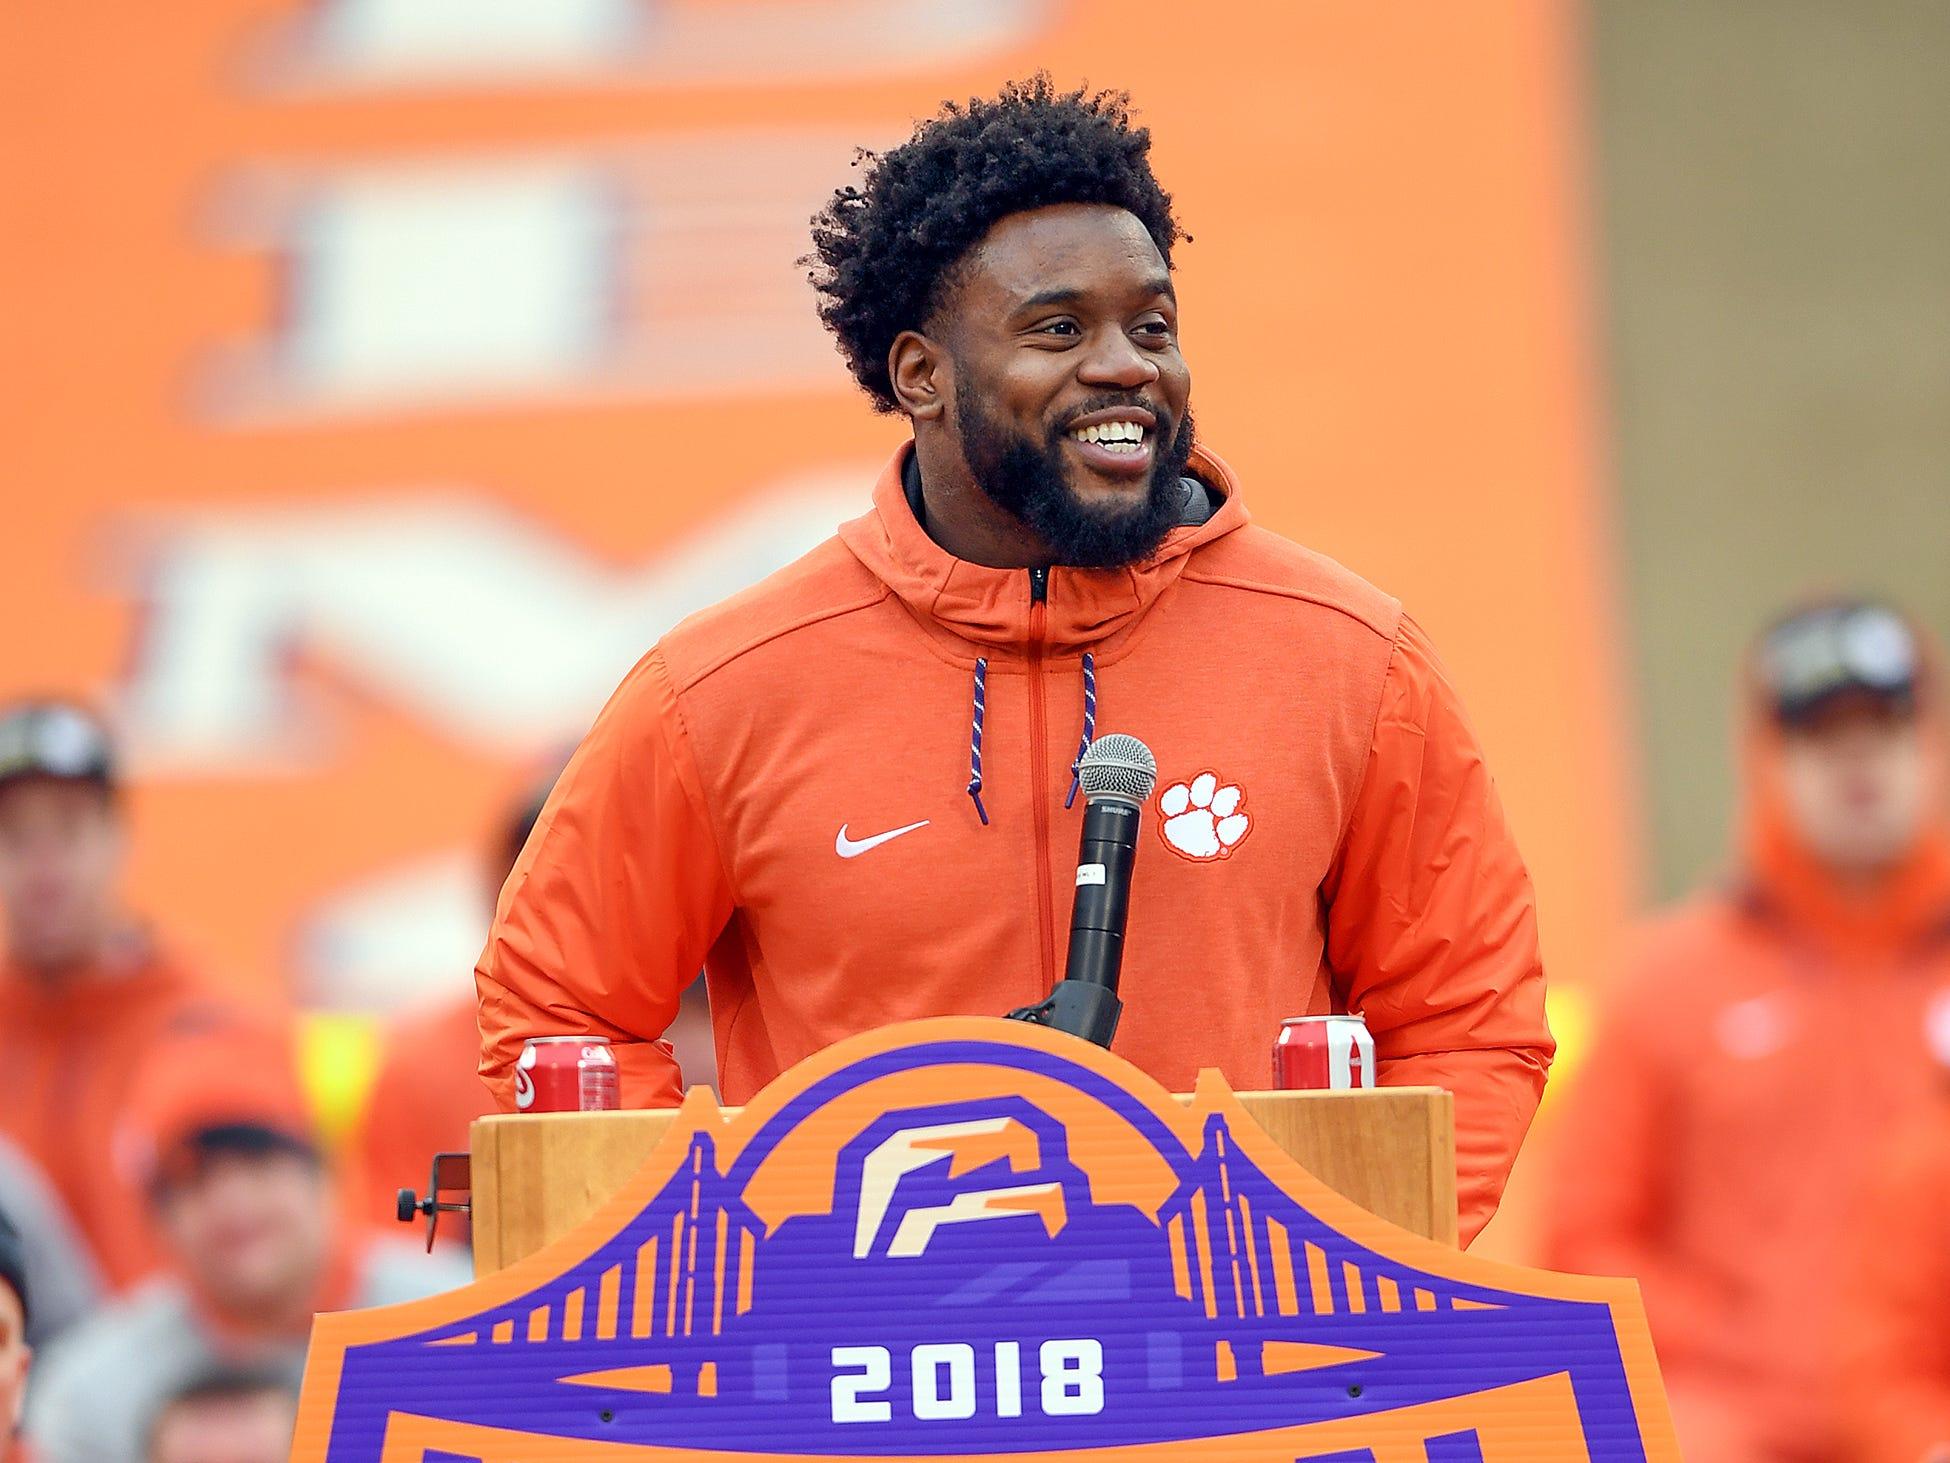 Clemson senior linebacker Kendall Joseph speaks during the Tigers National Championship celebration Saturday, January 12, 2019 at Clemson's Memorial Stadium.